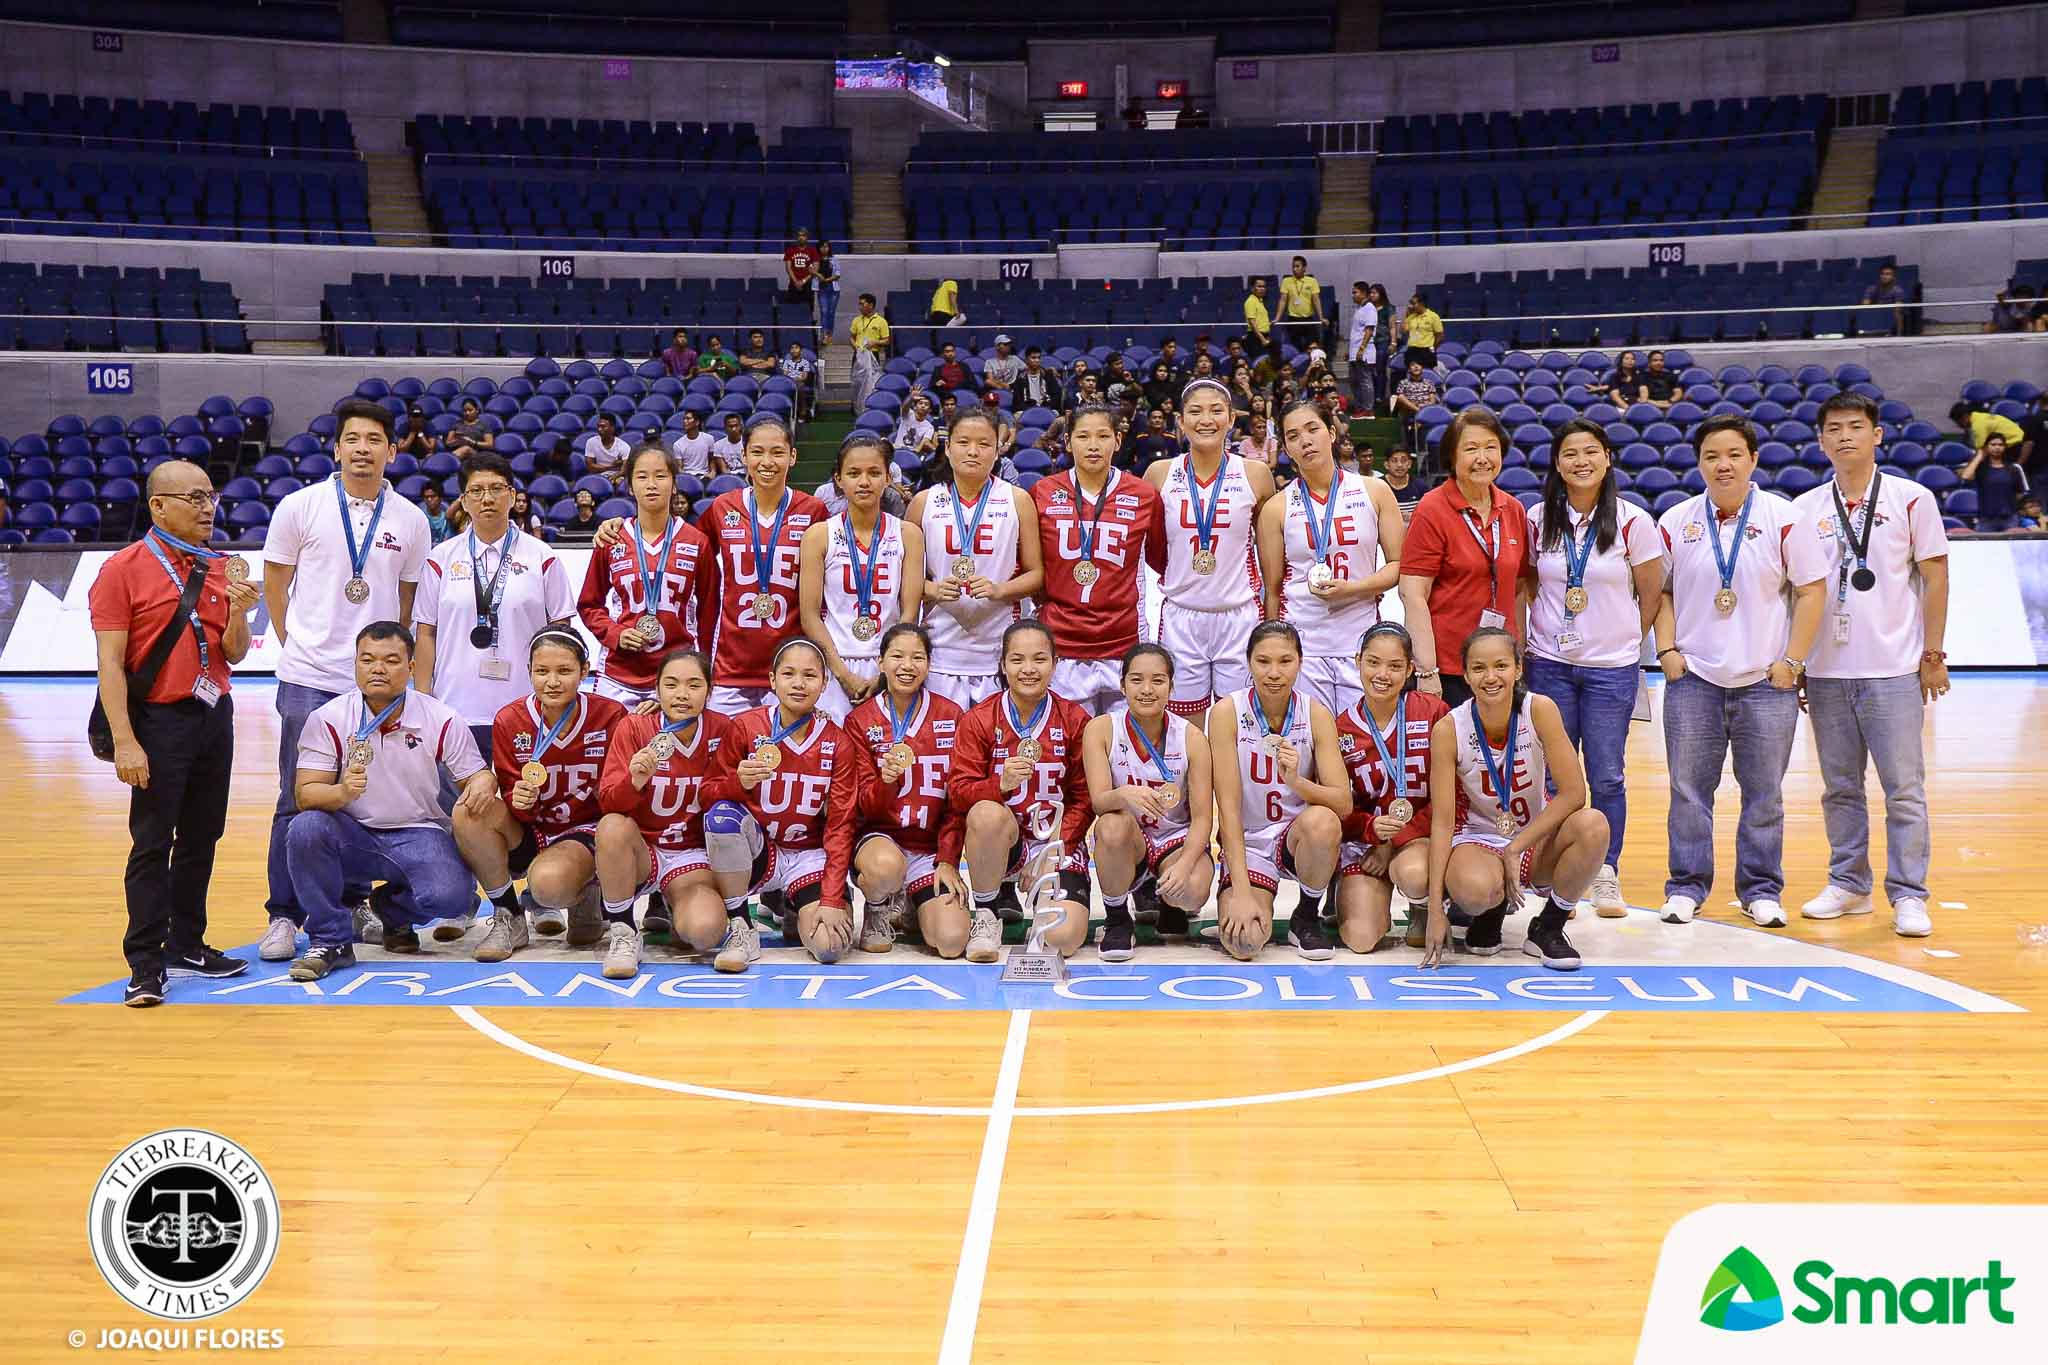 UAAP-80-Women-NU-vs.-UE-1575 Graduating seniors, Aileen Lebornio laud valiant UE after Finals loss to NU Basketball News UAAP UE  - philippine sports news